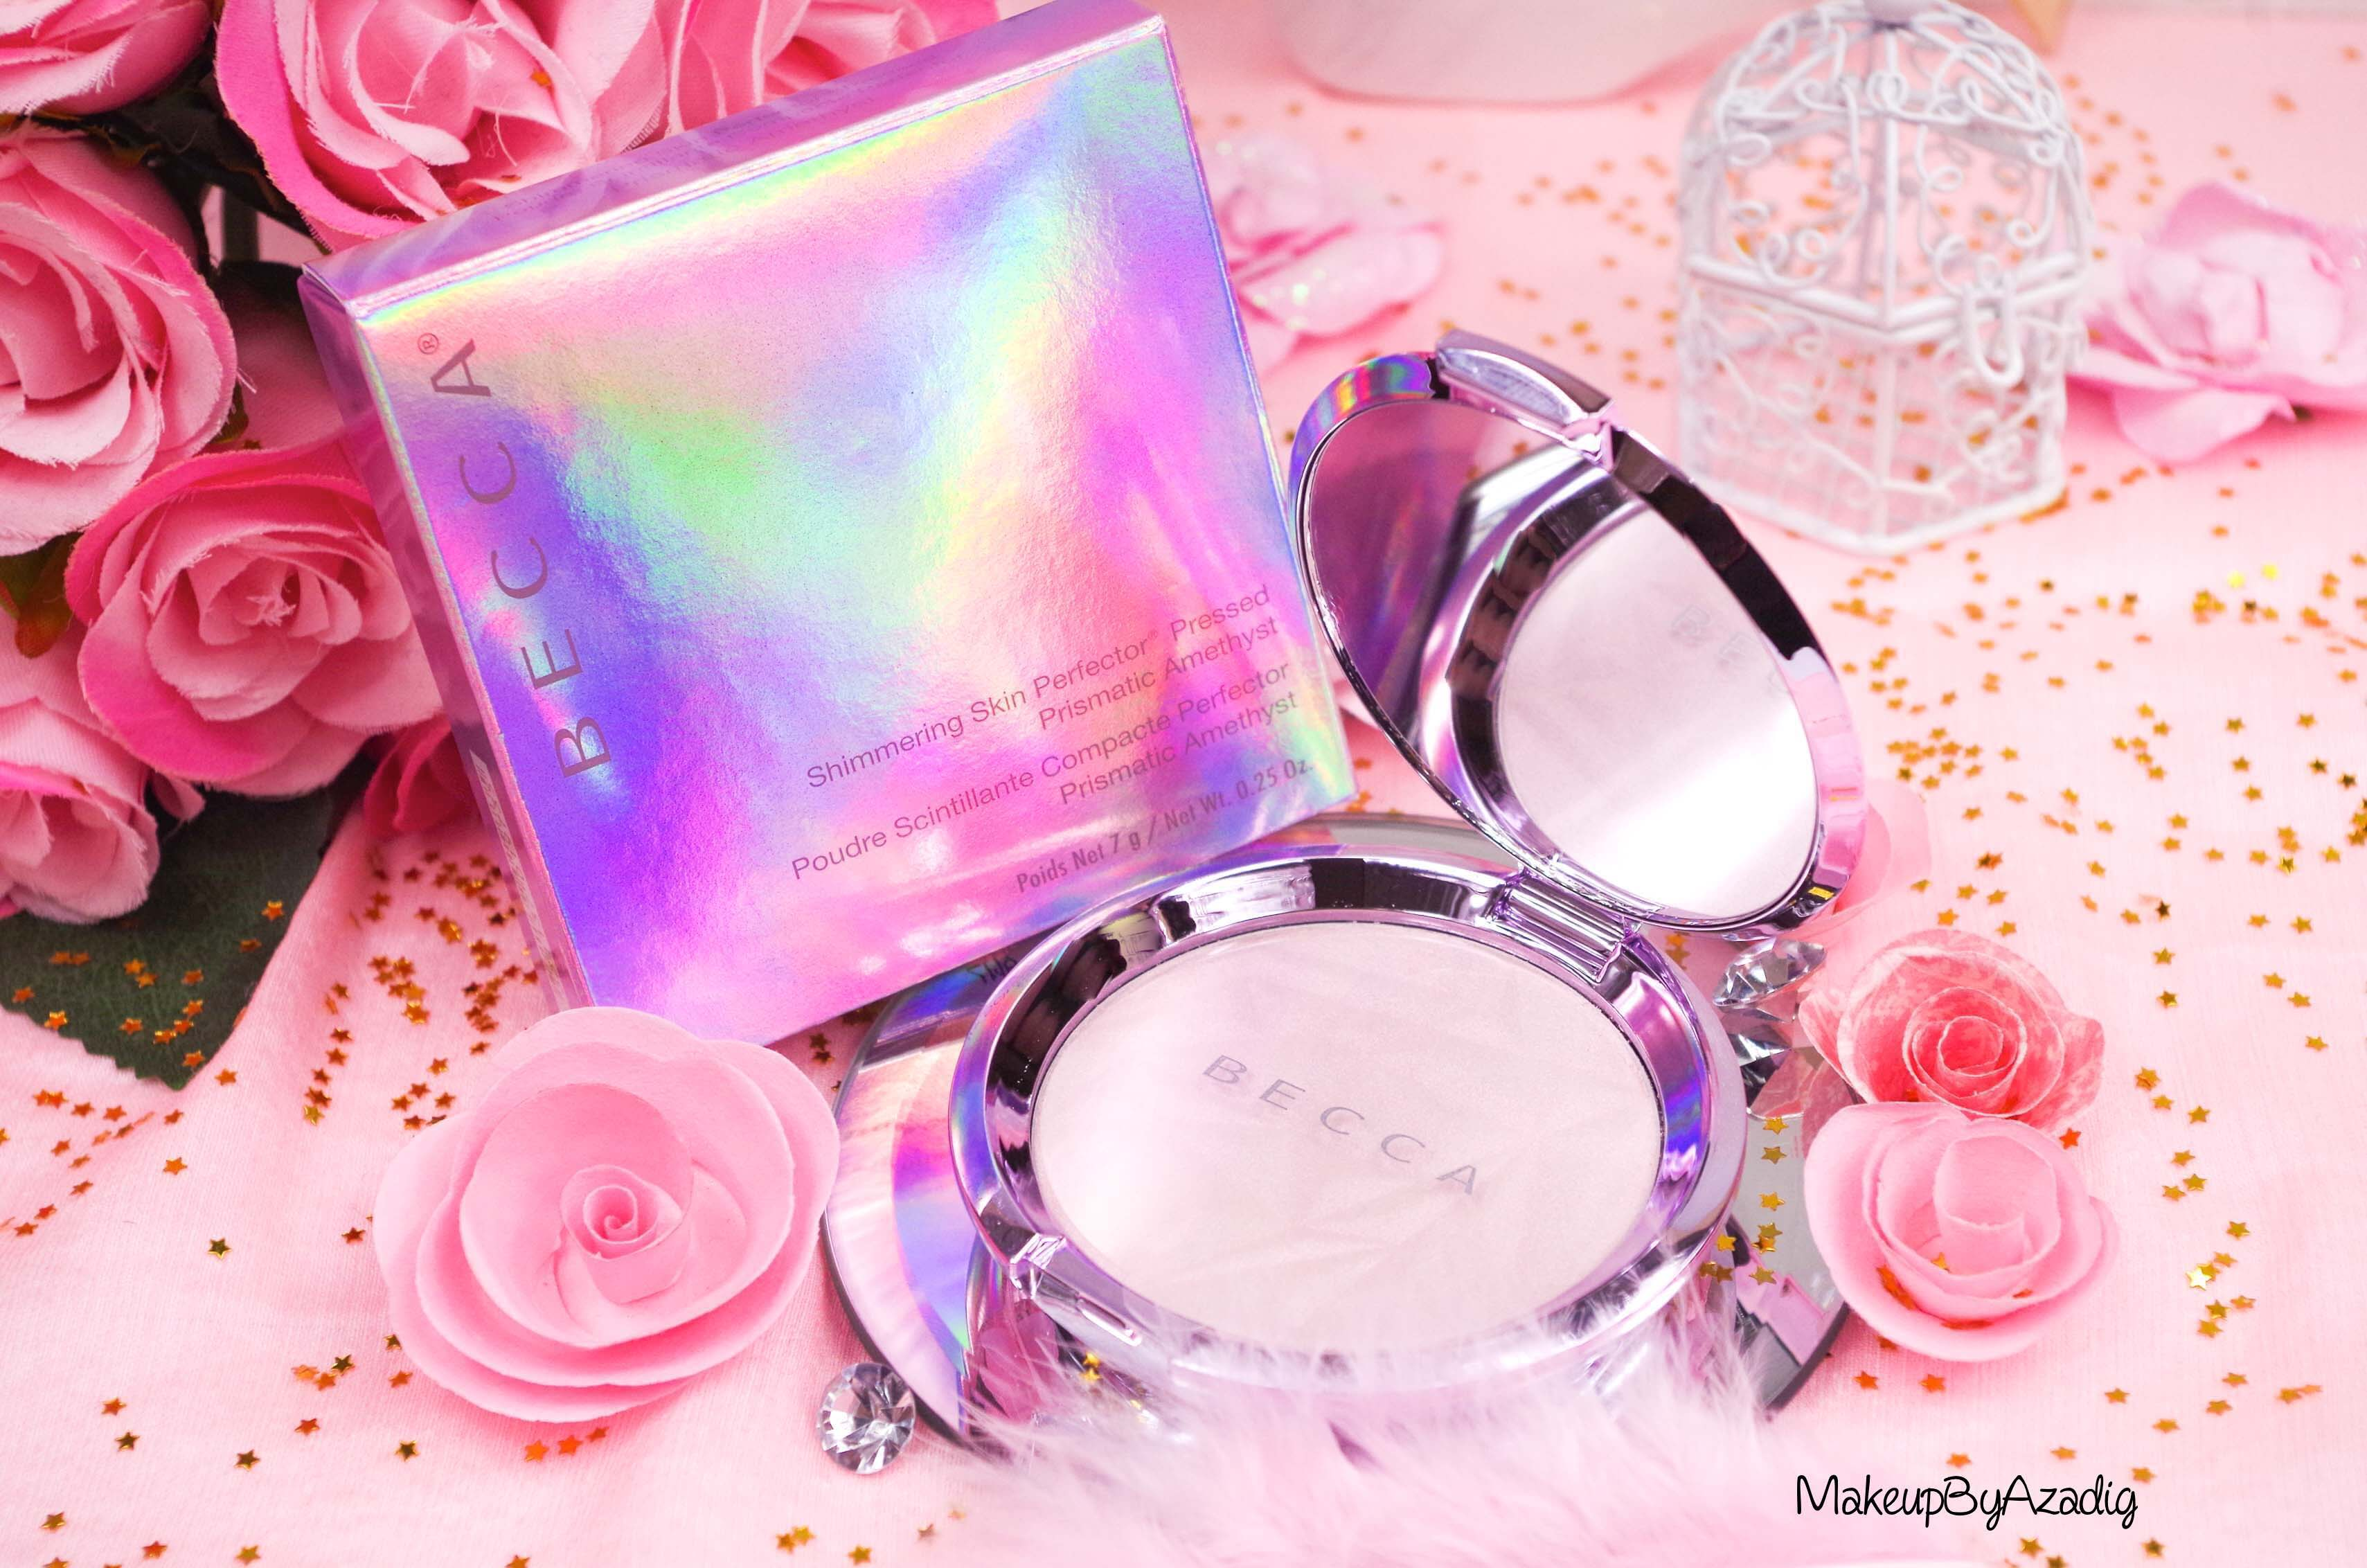 revue-becca-shimmering-skin-perfector-pressed-highlighter-enlumineur-violet-prismatic-amethyst-avis-swatch-prix-makeupbyazadig-sephora-2